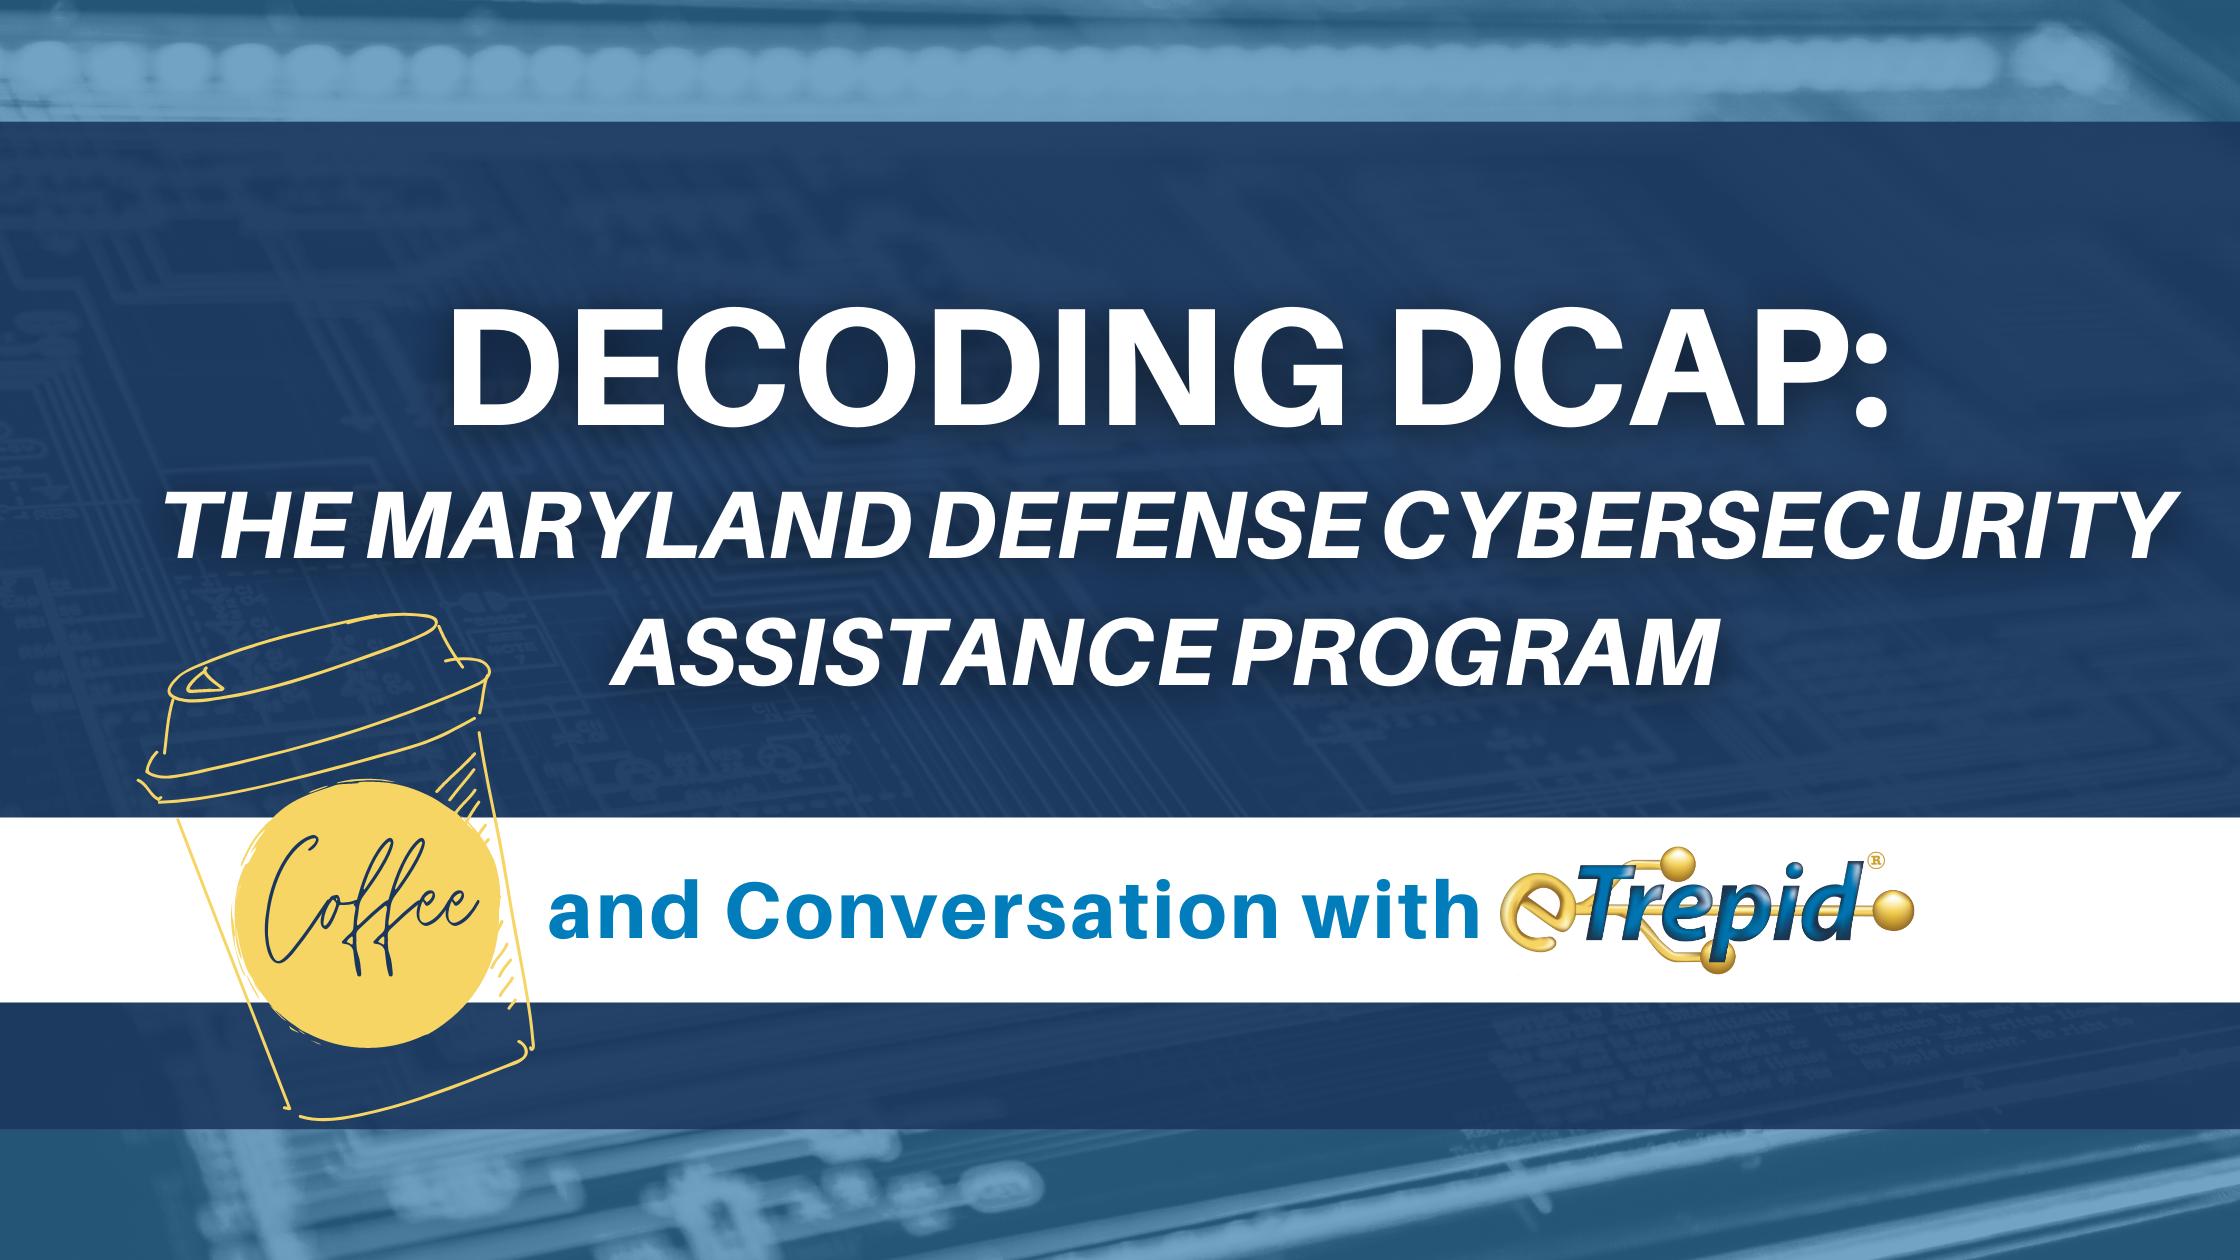 Decoding DCAP